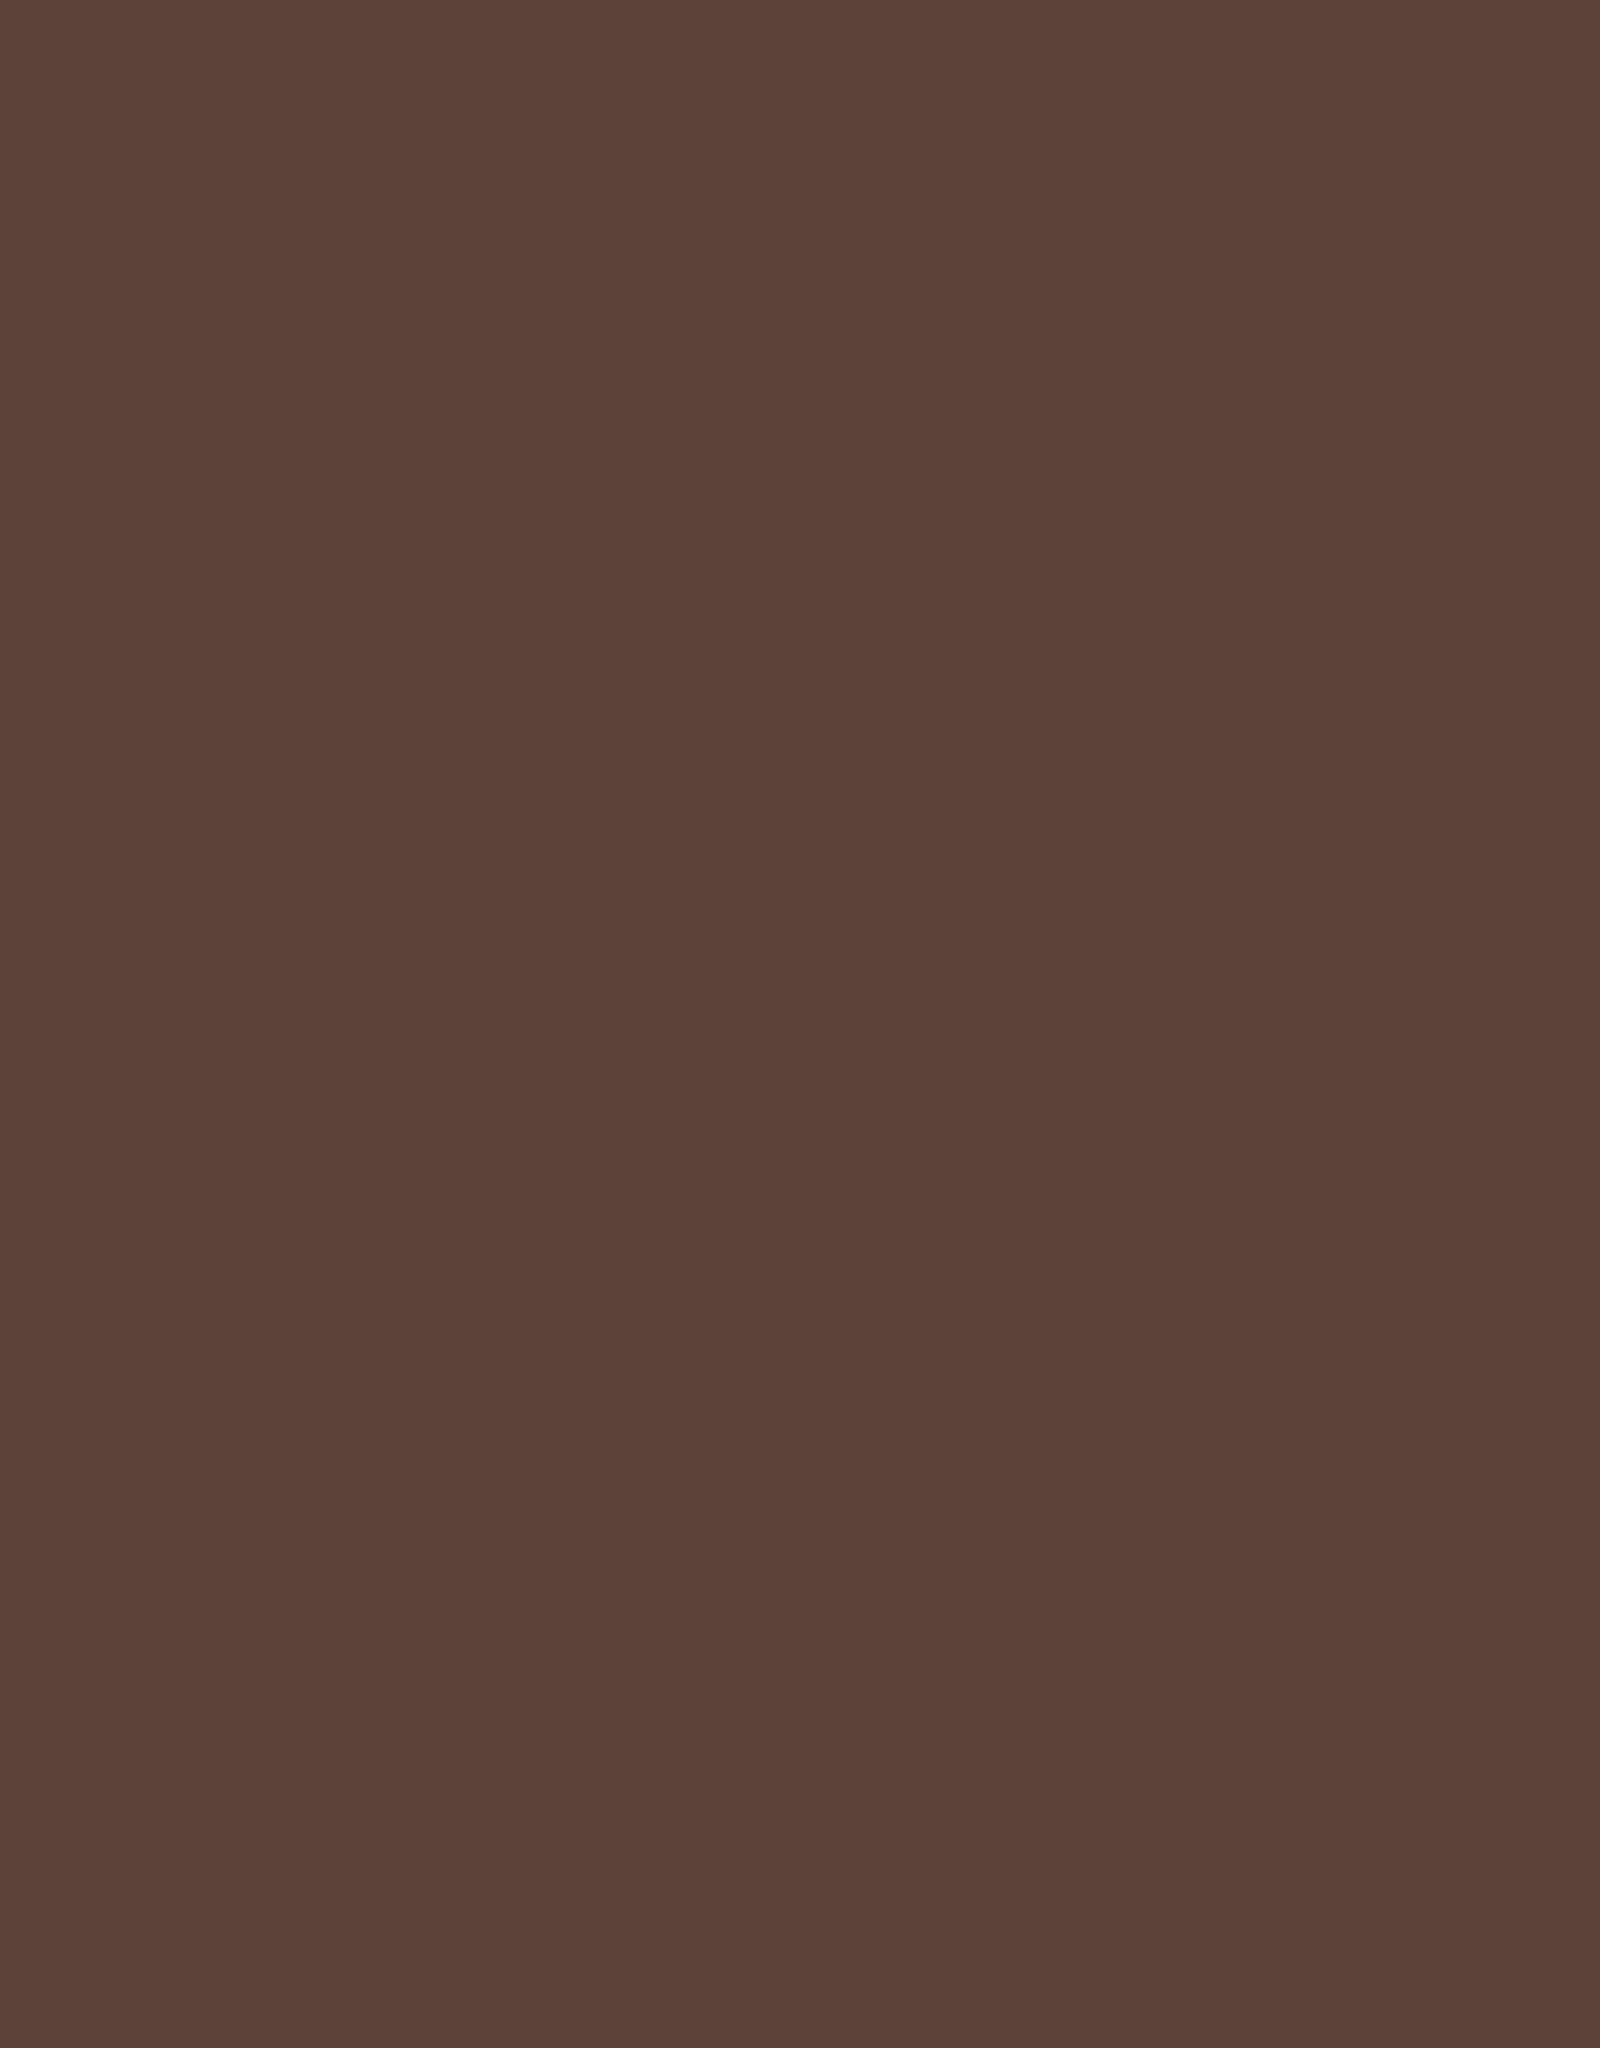 Sennelier, Extra Fine Soft Pastel, Hot Brown